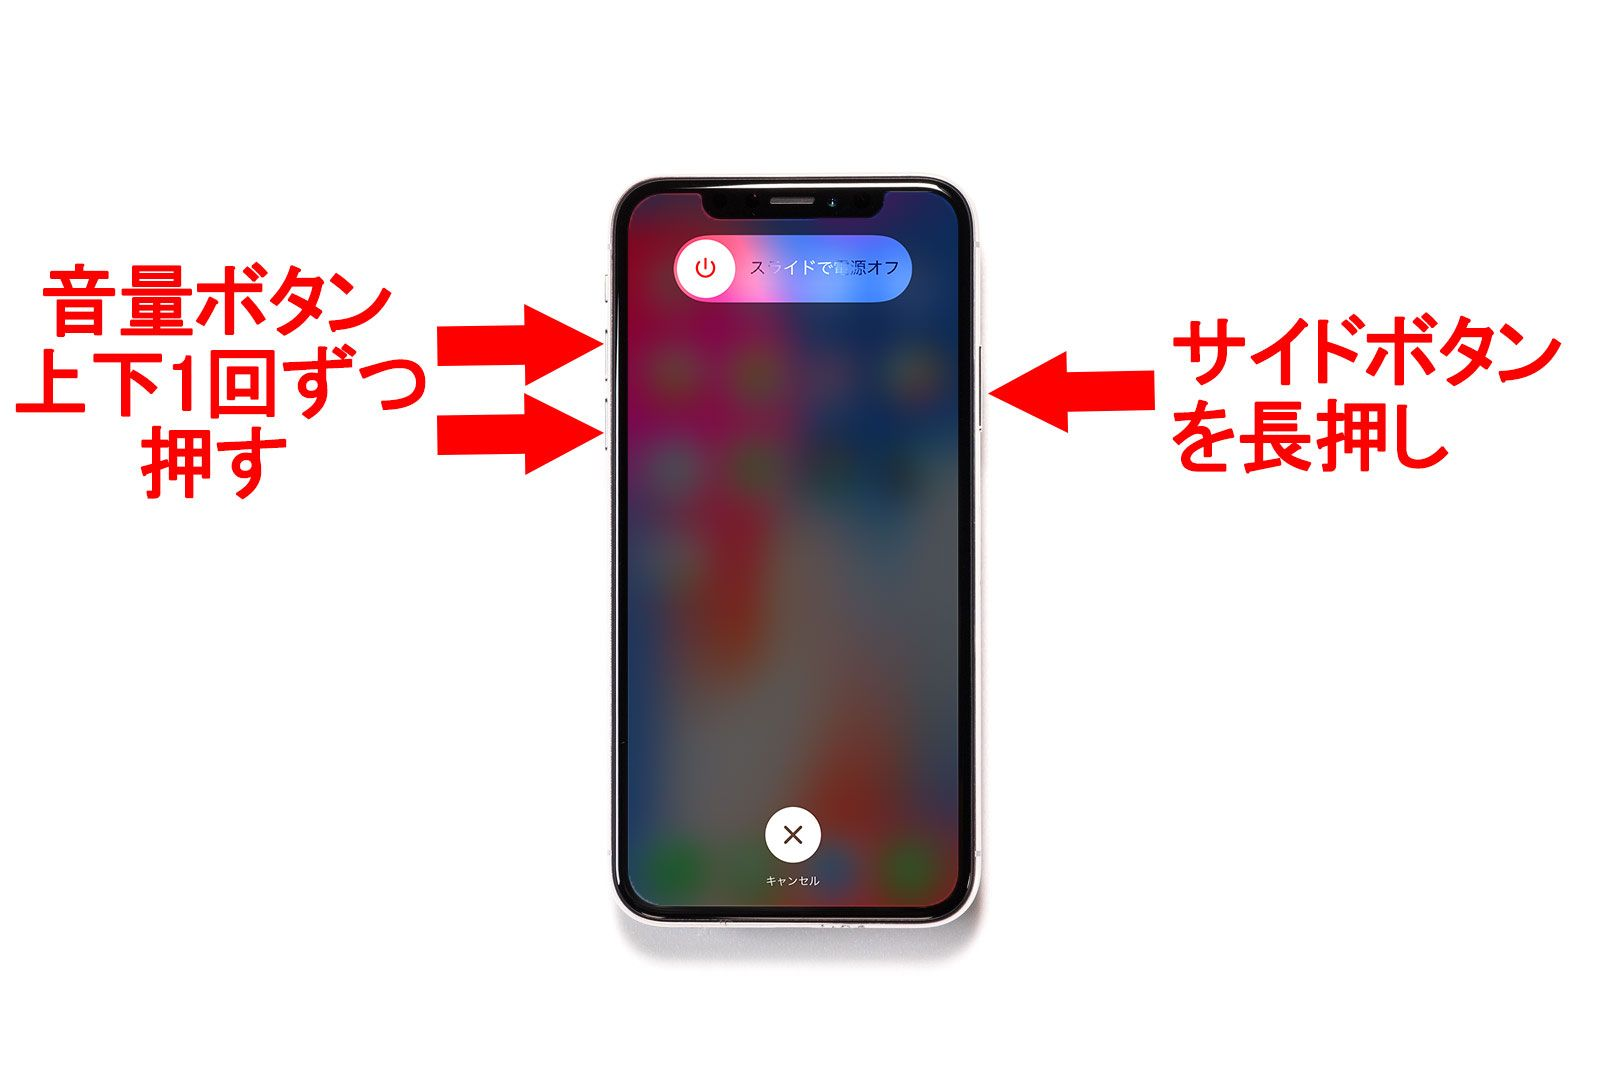 iPhone Xシリーズ 強制再起動方法